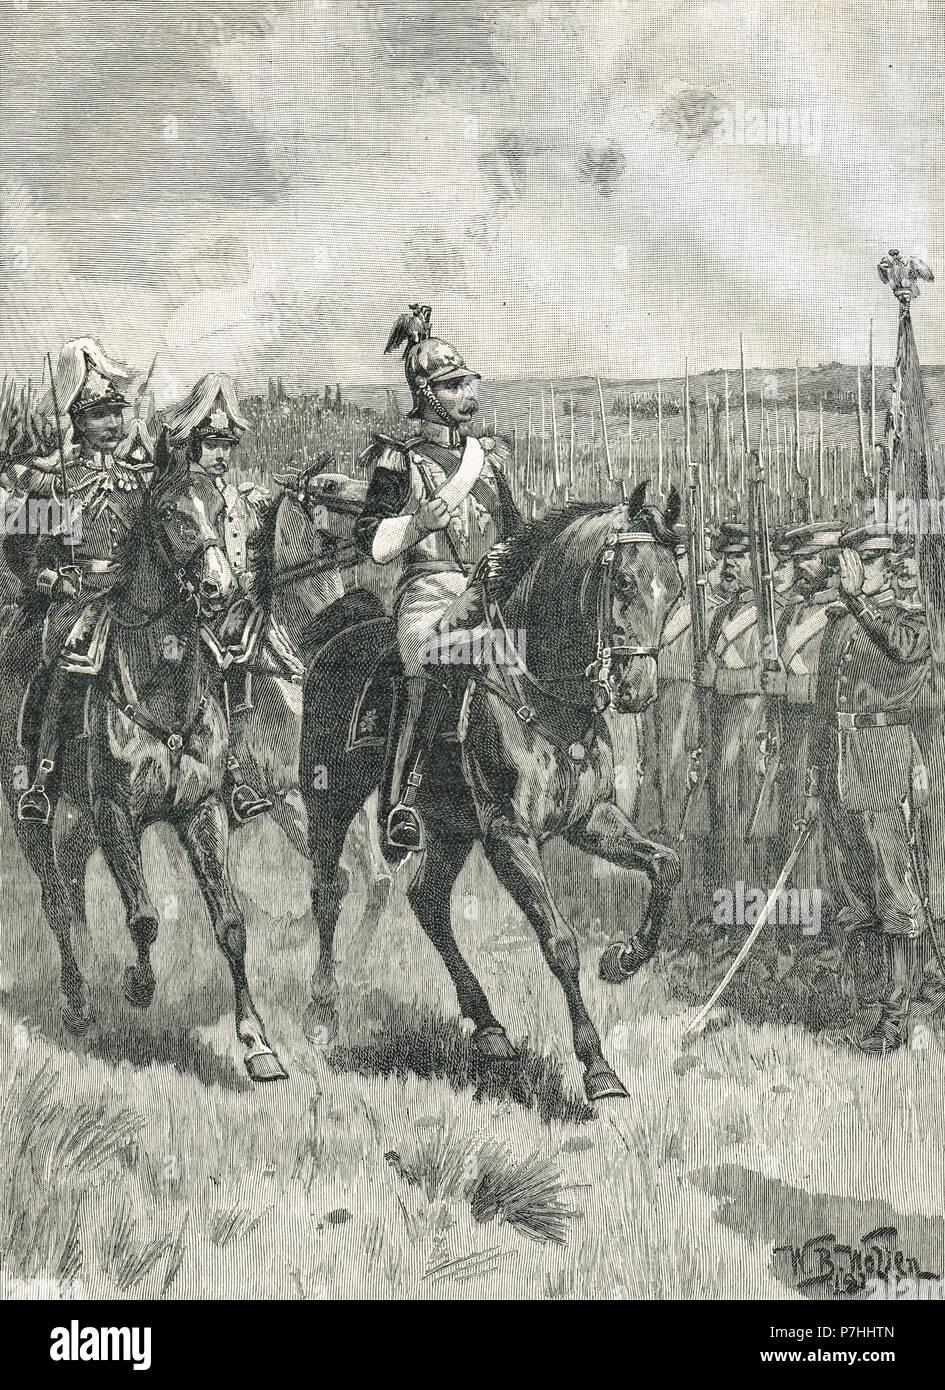 Tsar Nicholas reviewing his troops, Sevastopol, 1855, the Crimean war - Stock Image